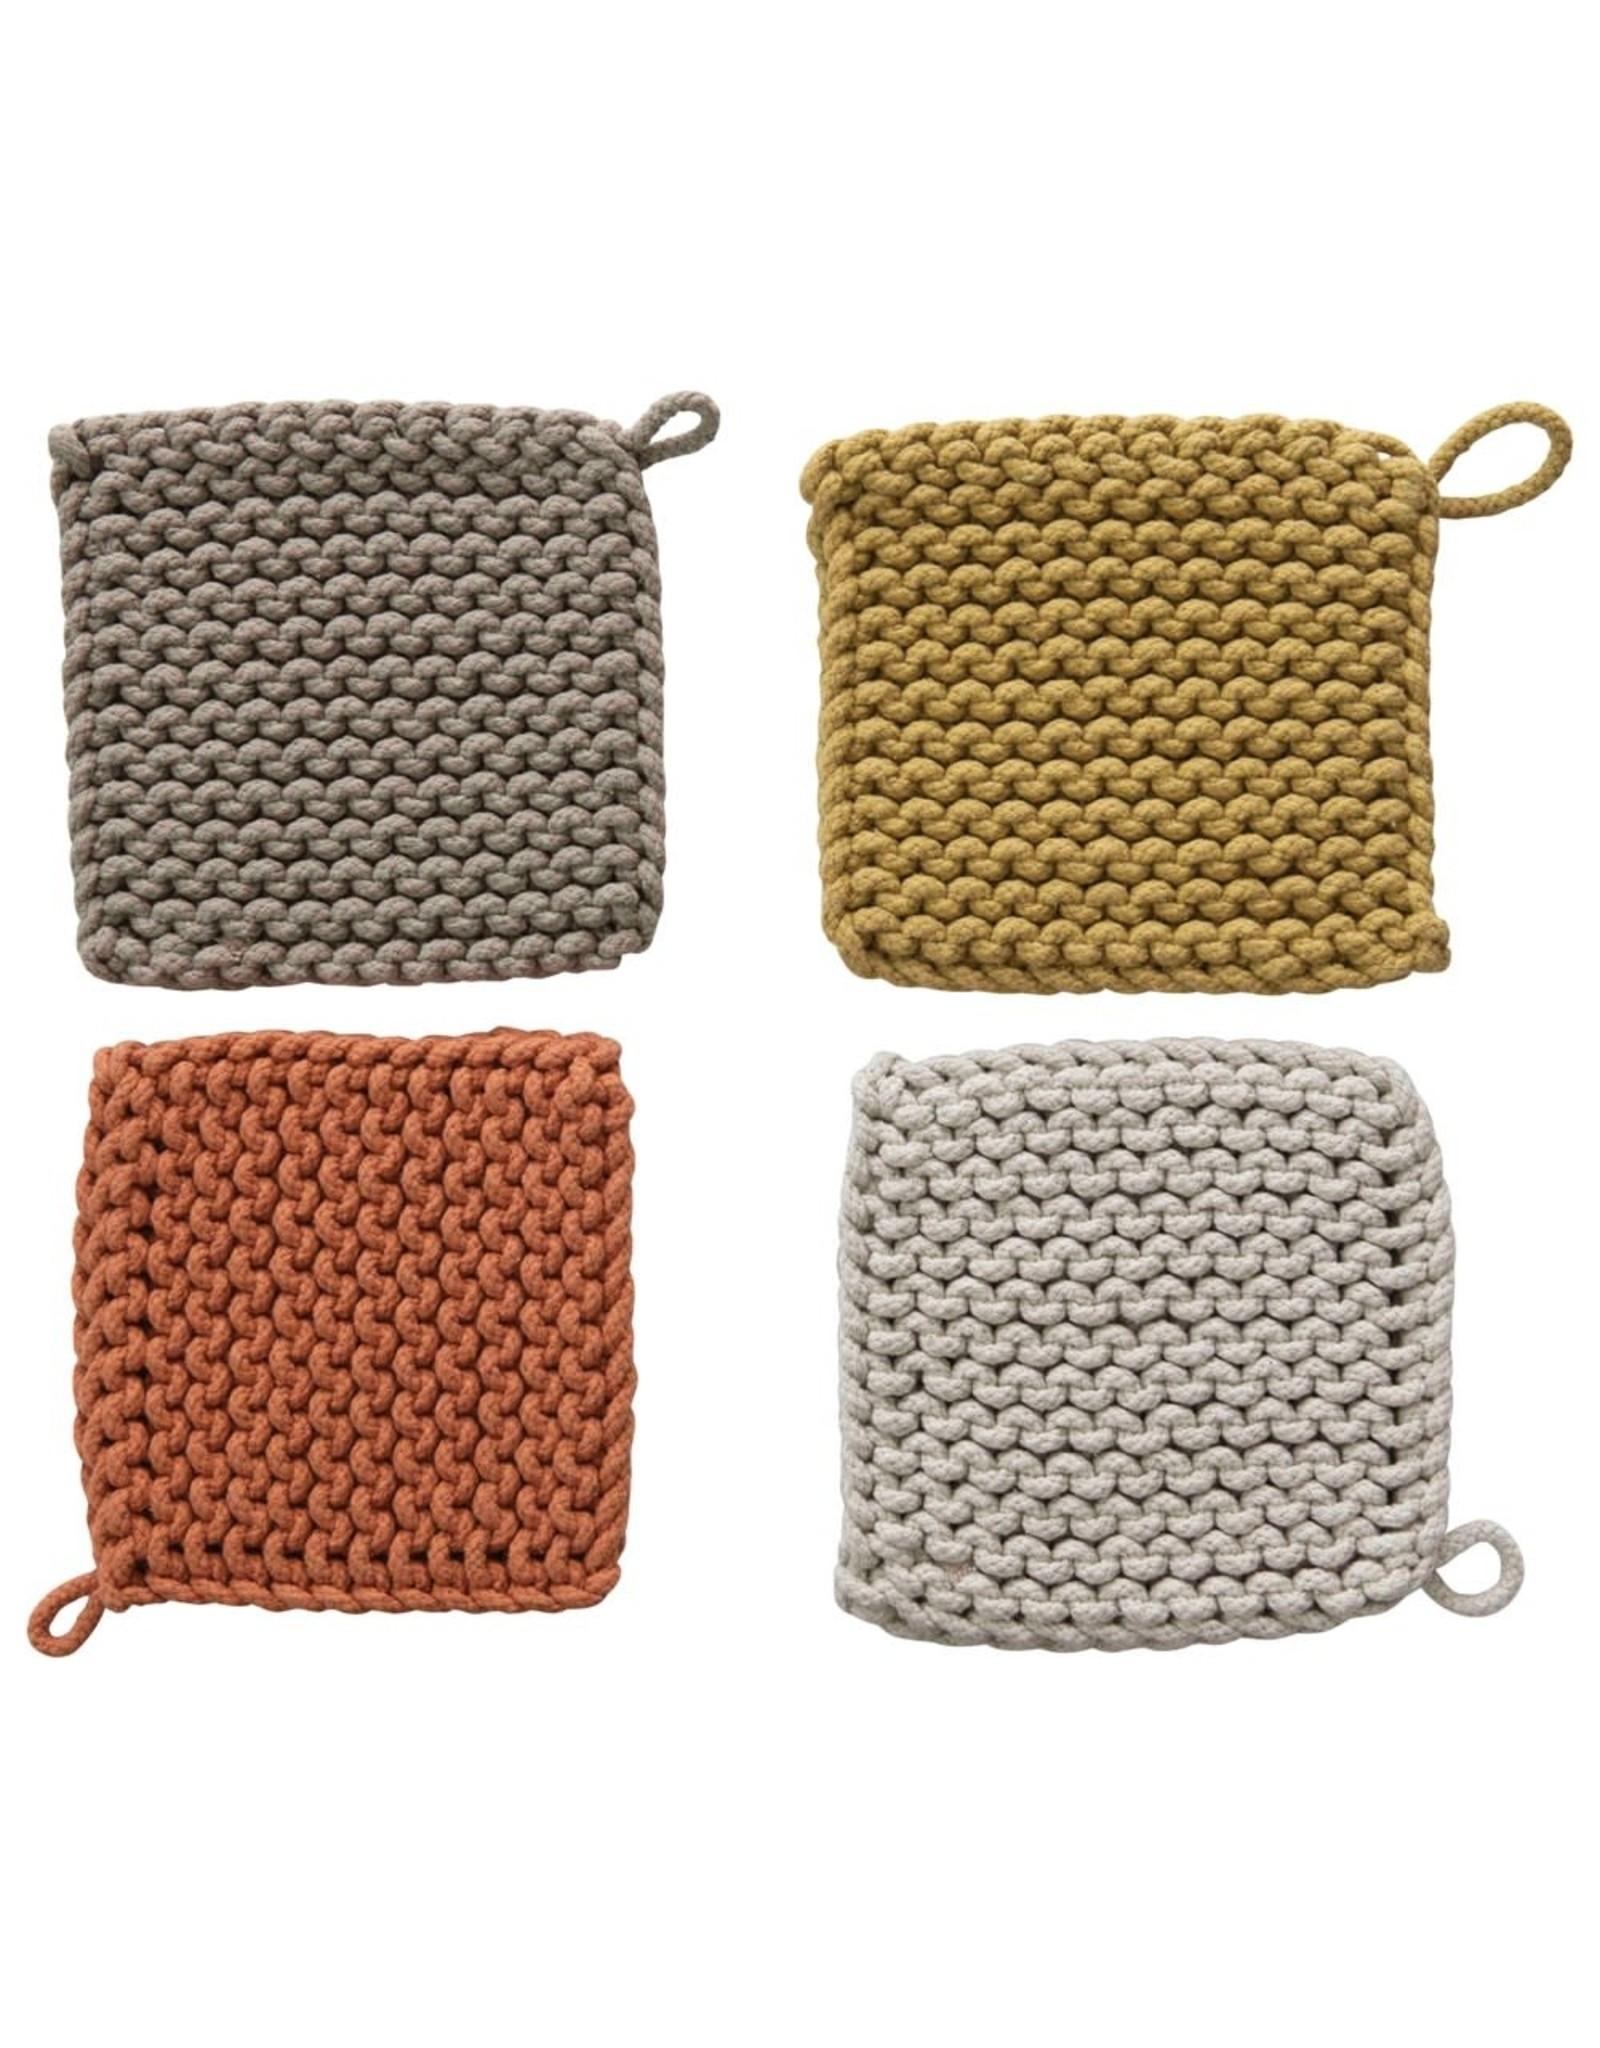 Oak + Arrow Interiors Crocheted Pot Holder - Mustard